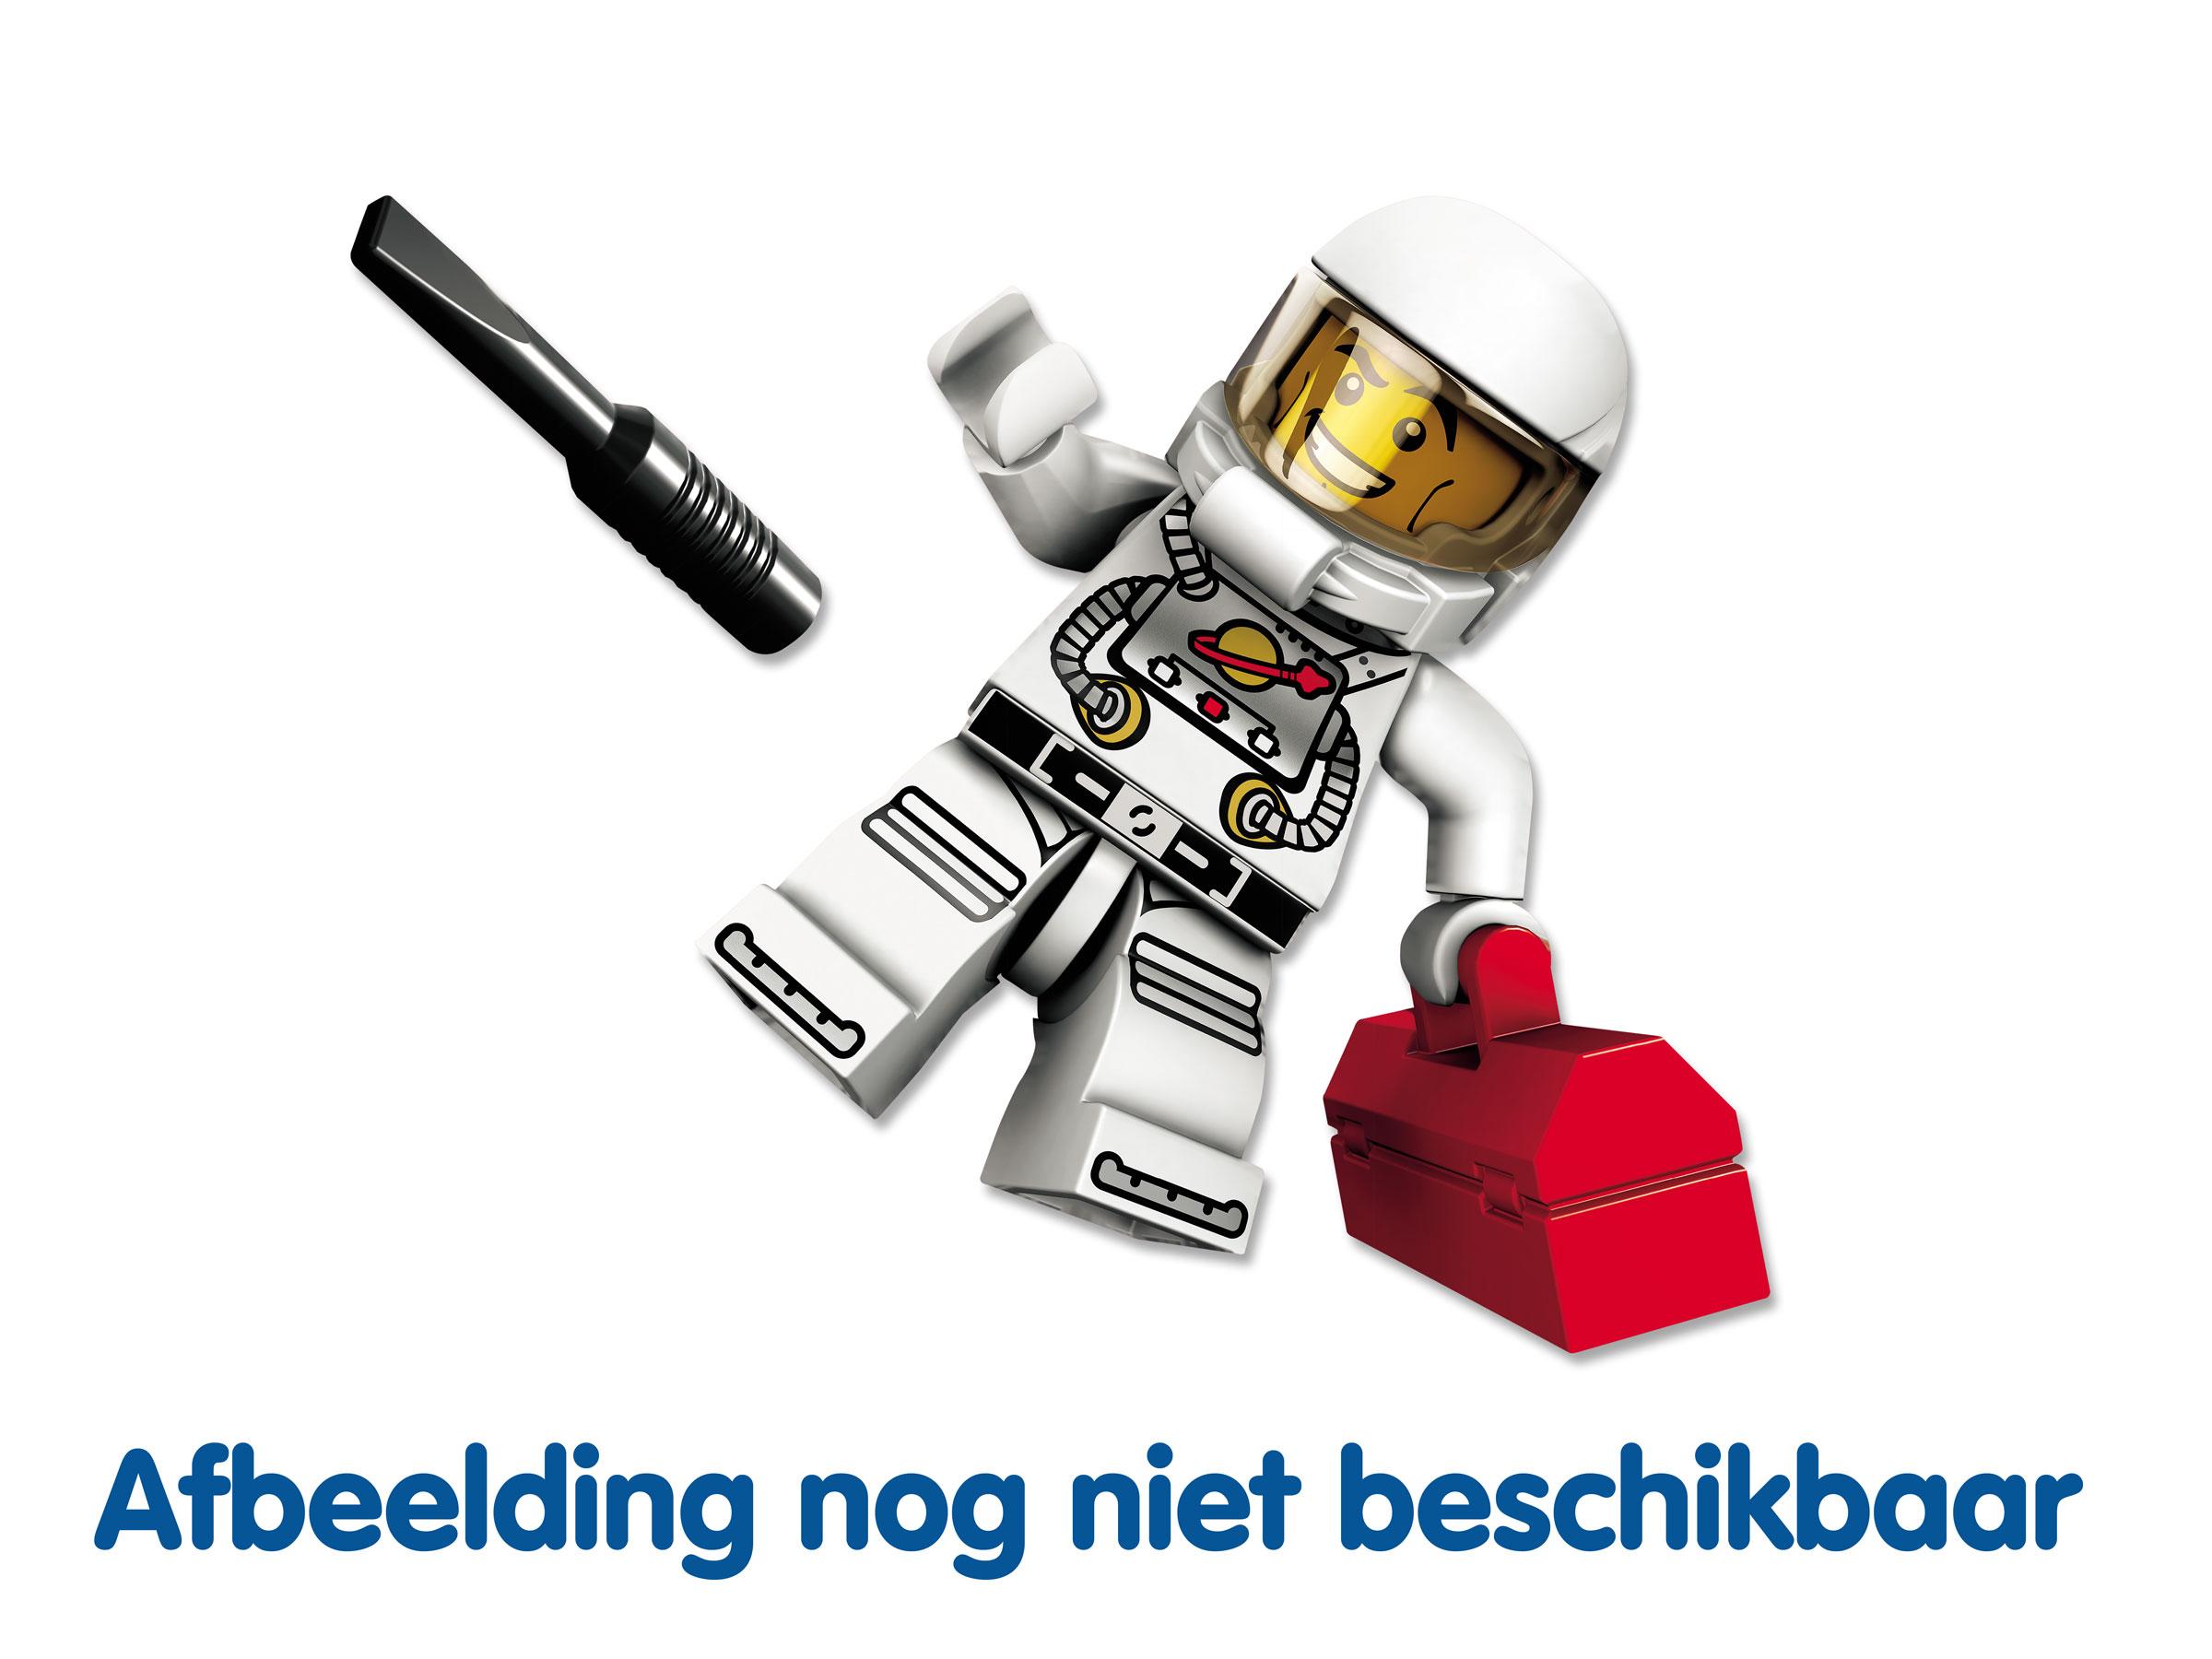 LEGO Nexo Knights 70324 Merlok's Bibliotheek 2.0